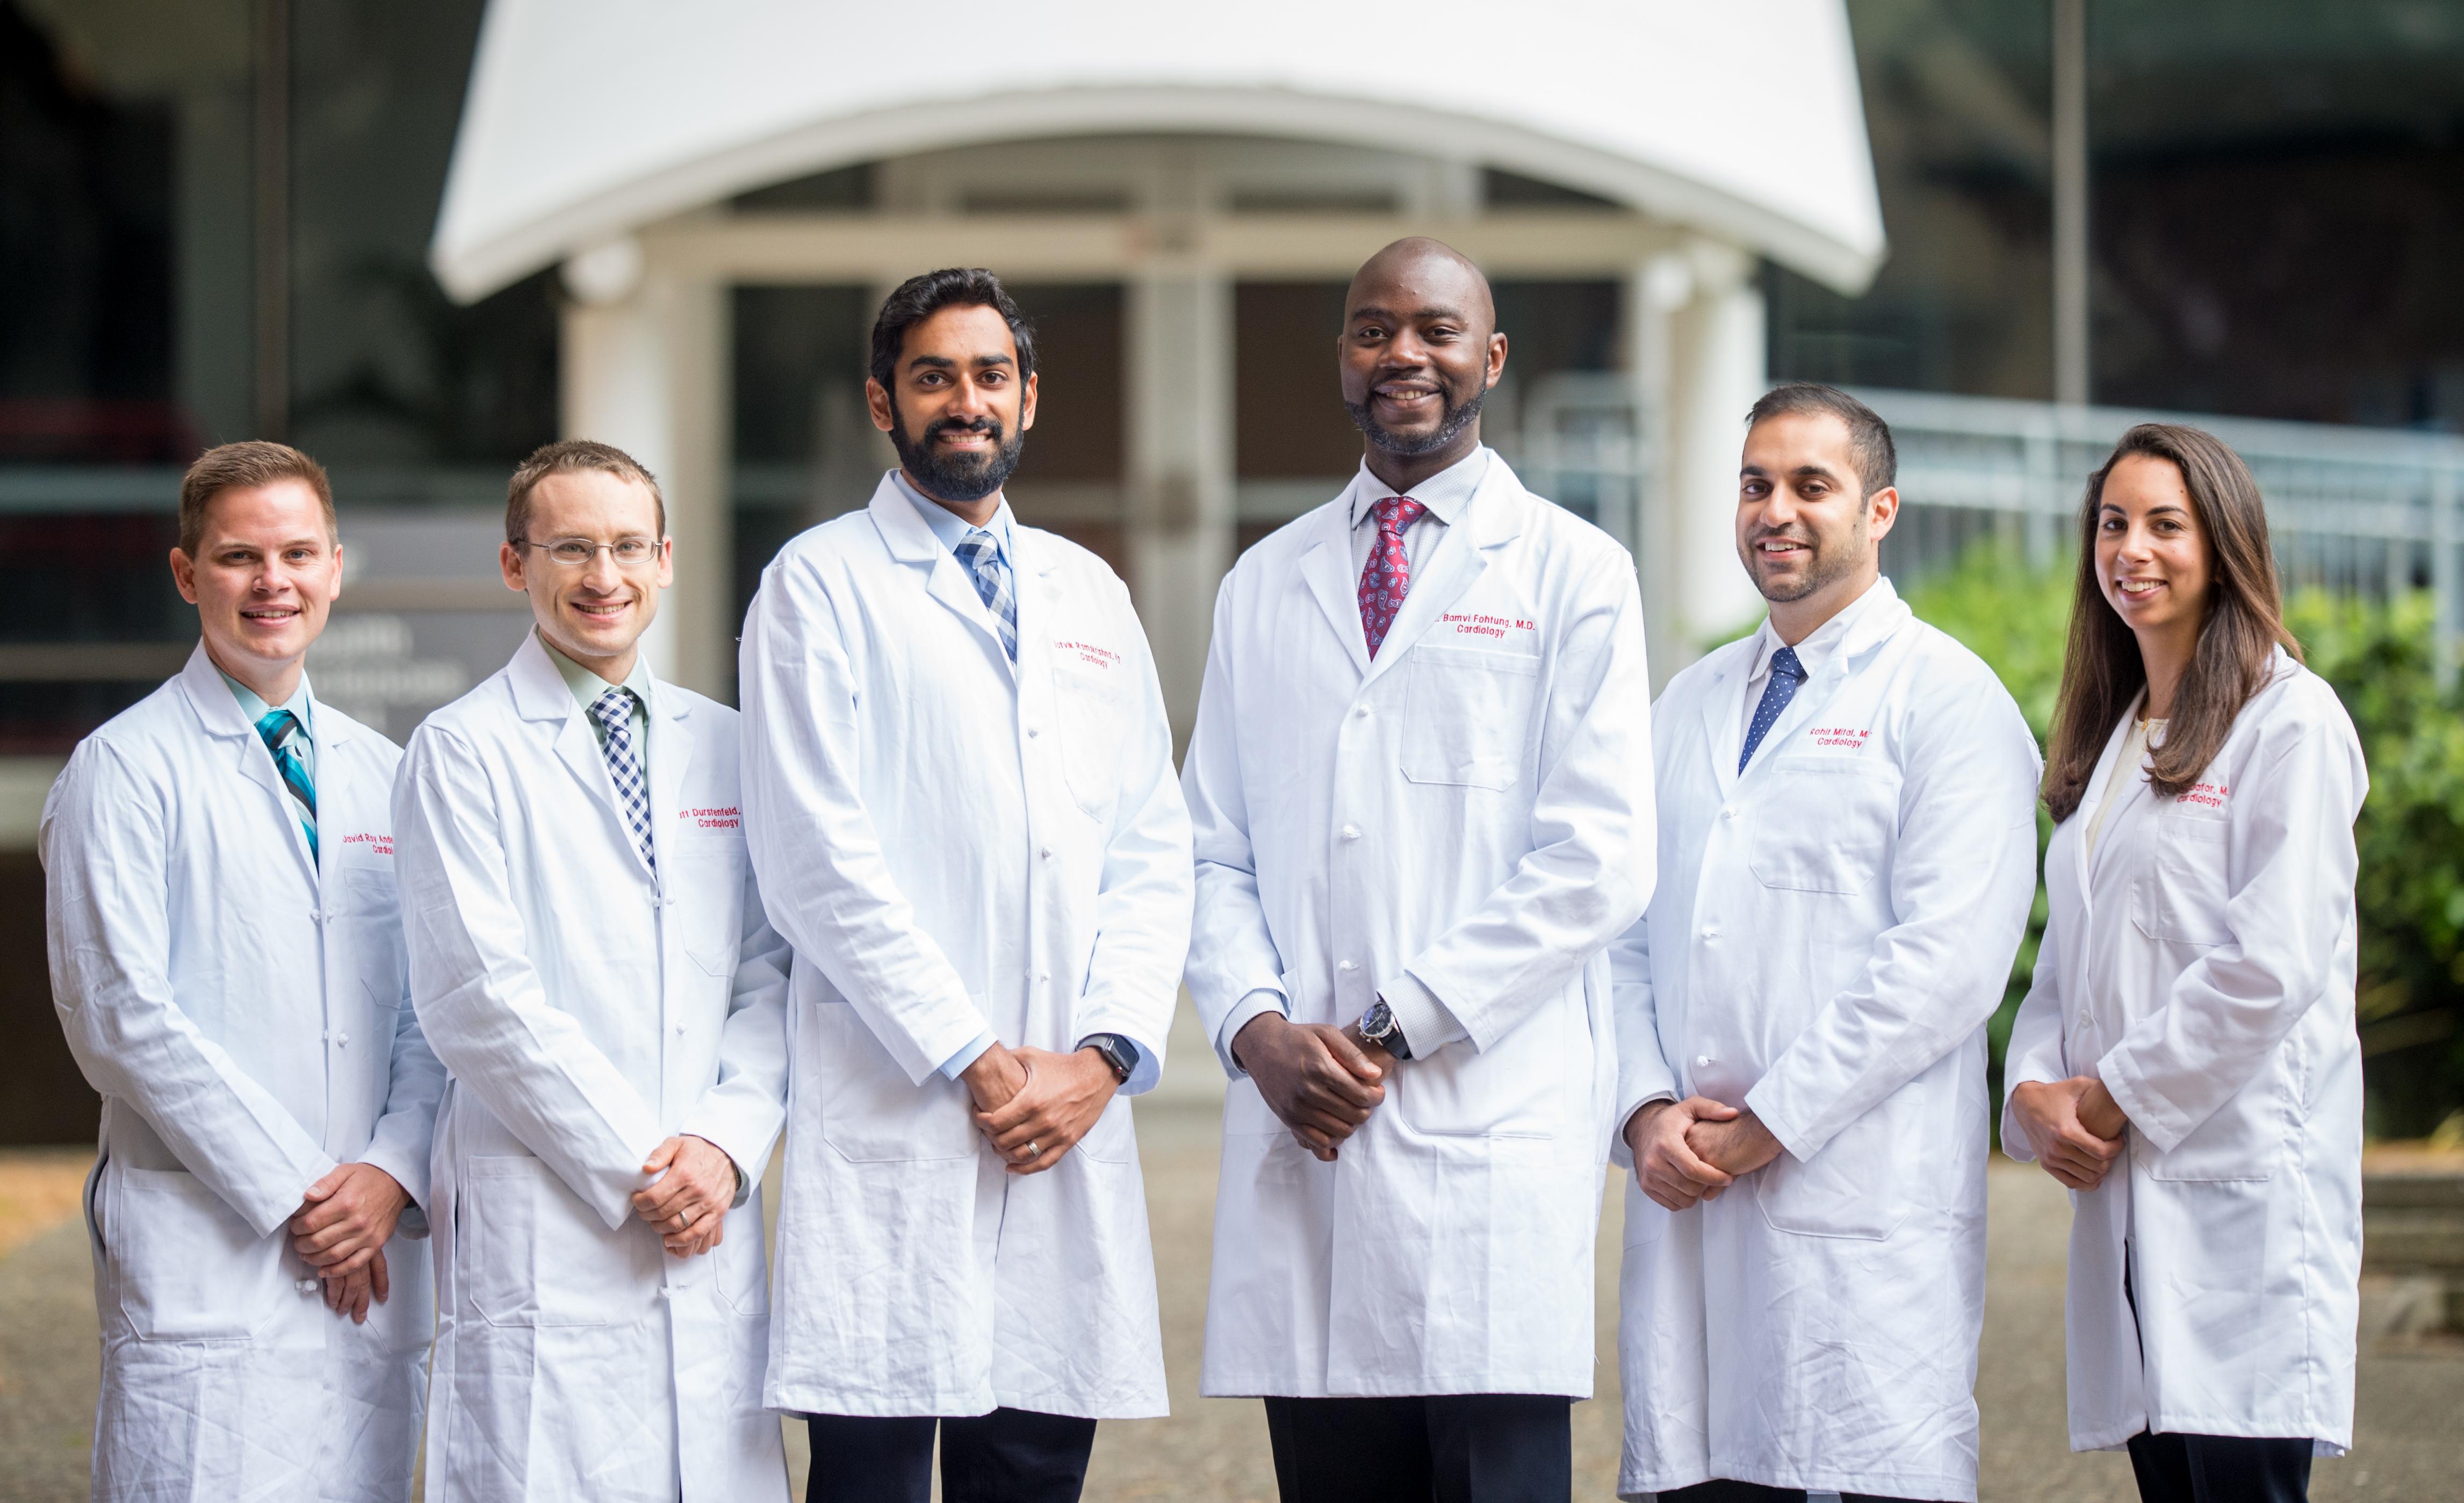 Education & Training | UCSF Cardiology